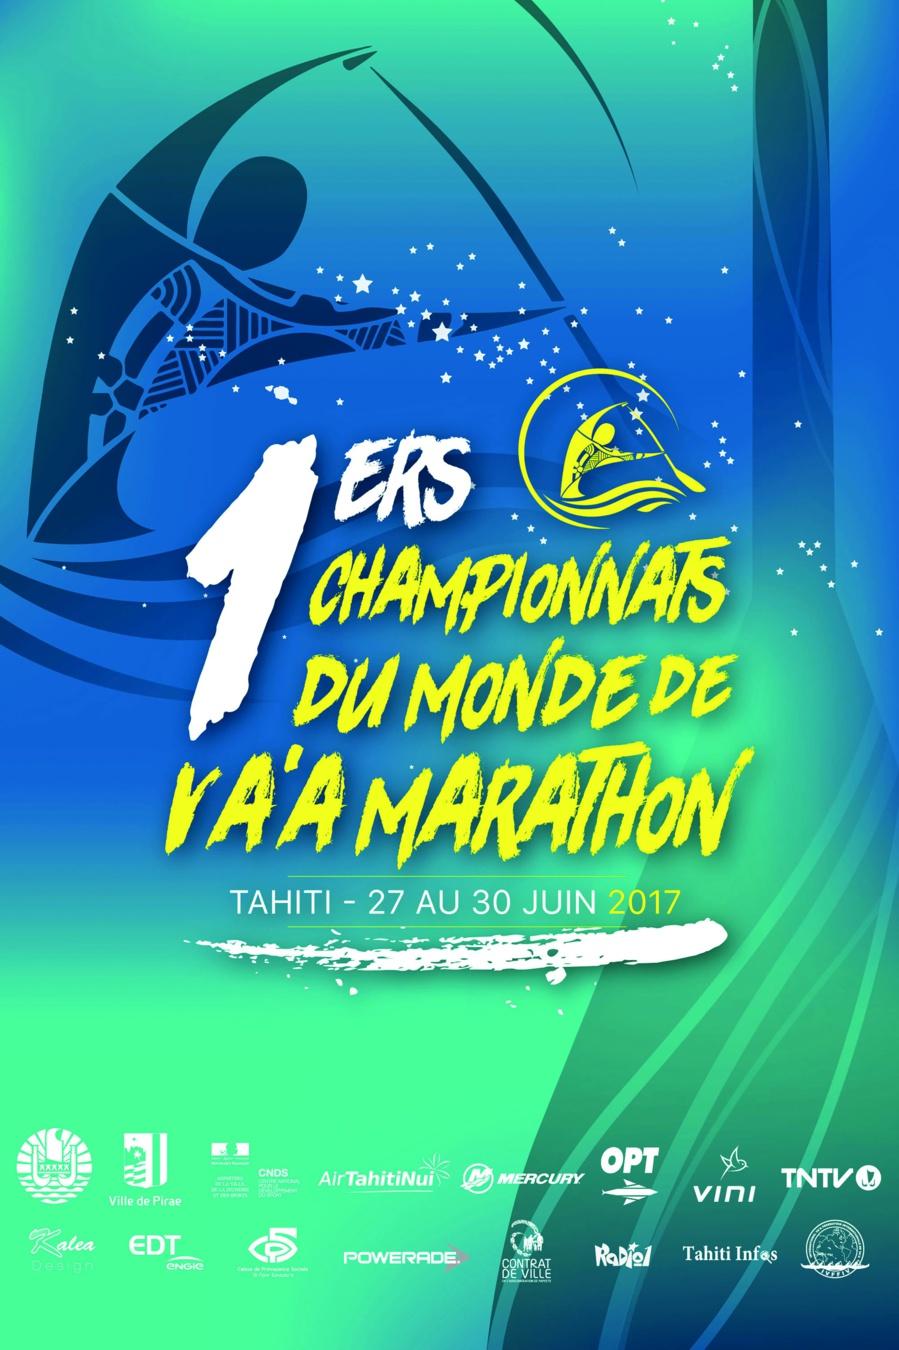 http://www.tahiti-infos.com/agenda/Championnats-du-monde-de-va-a-marathon_ae488404.html